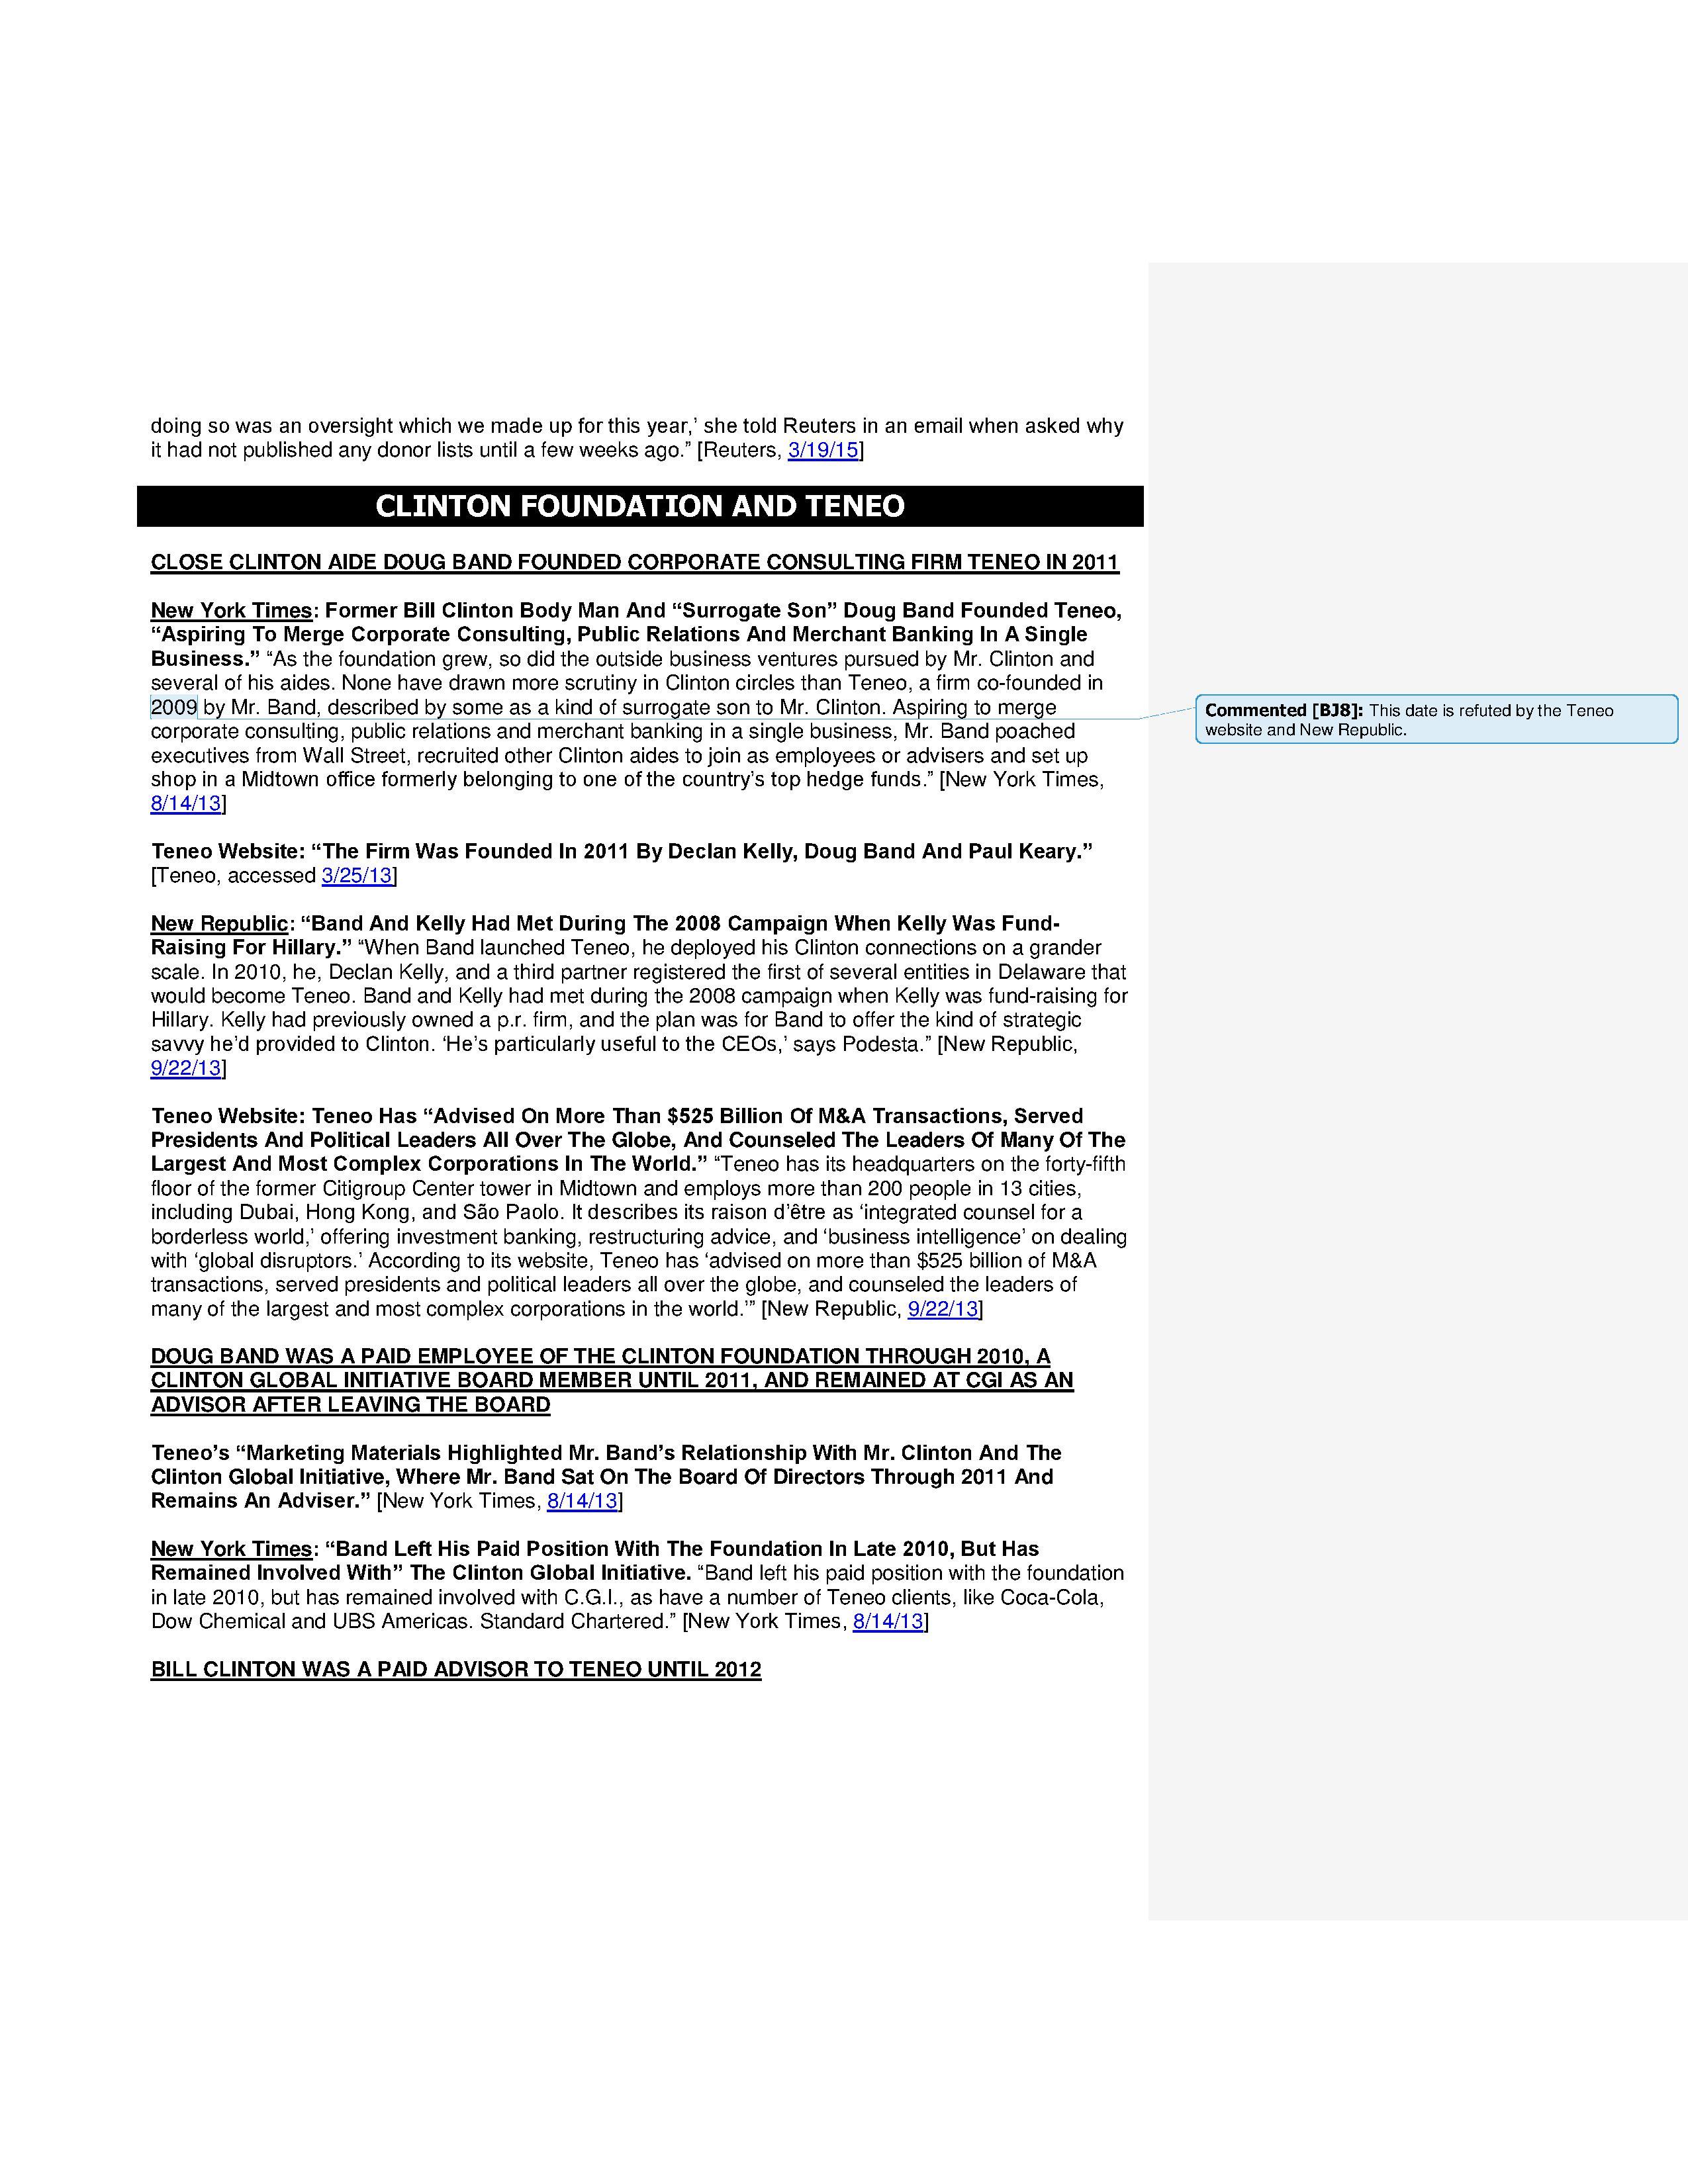 Clinton Foundation Vulnerabilities Master Doc part 1 JB edits